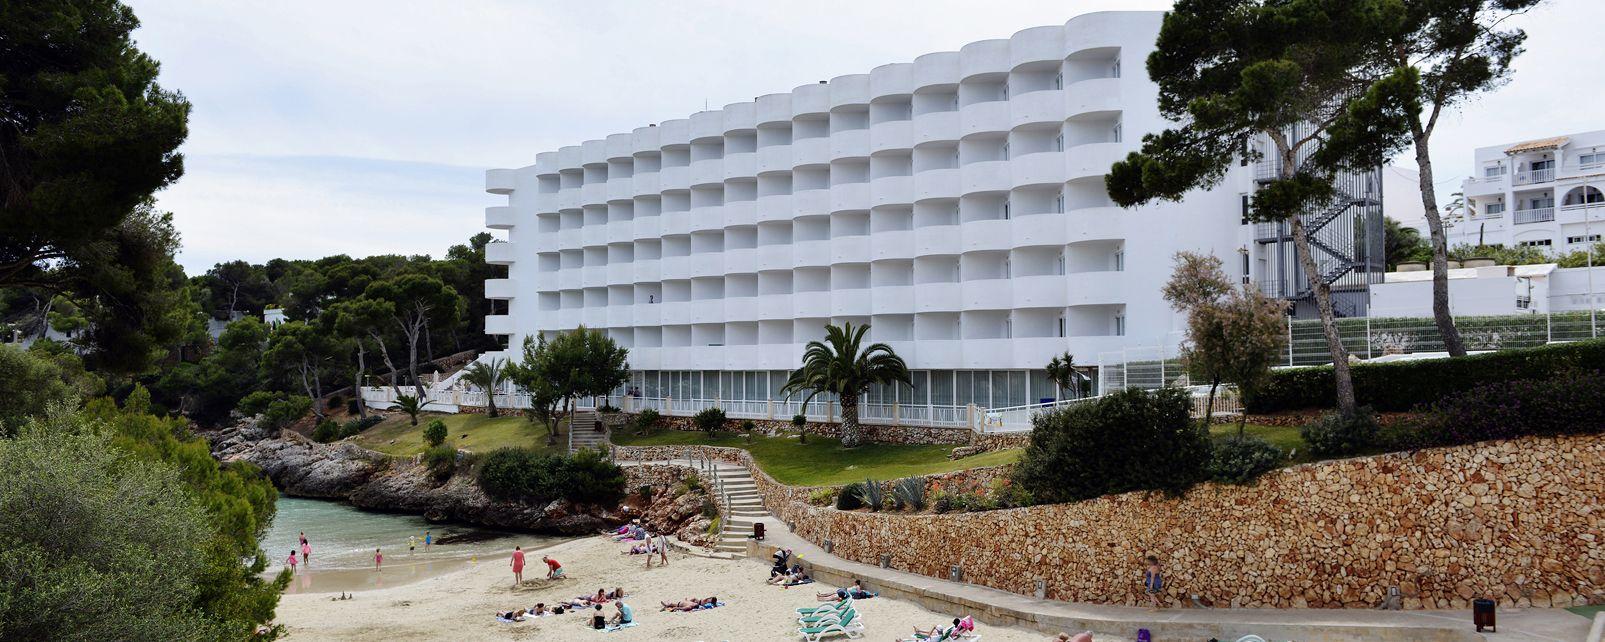 Hôtel Marina Corfu